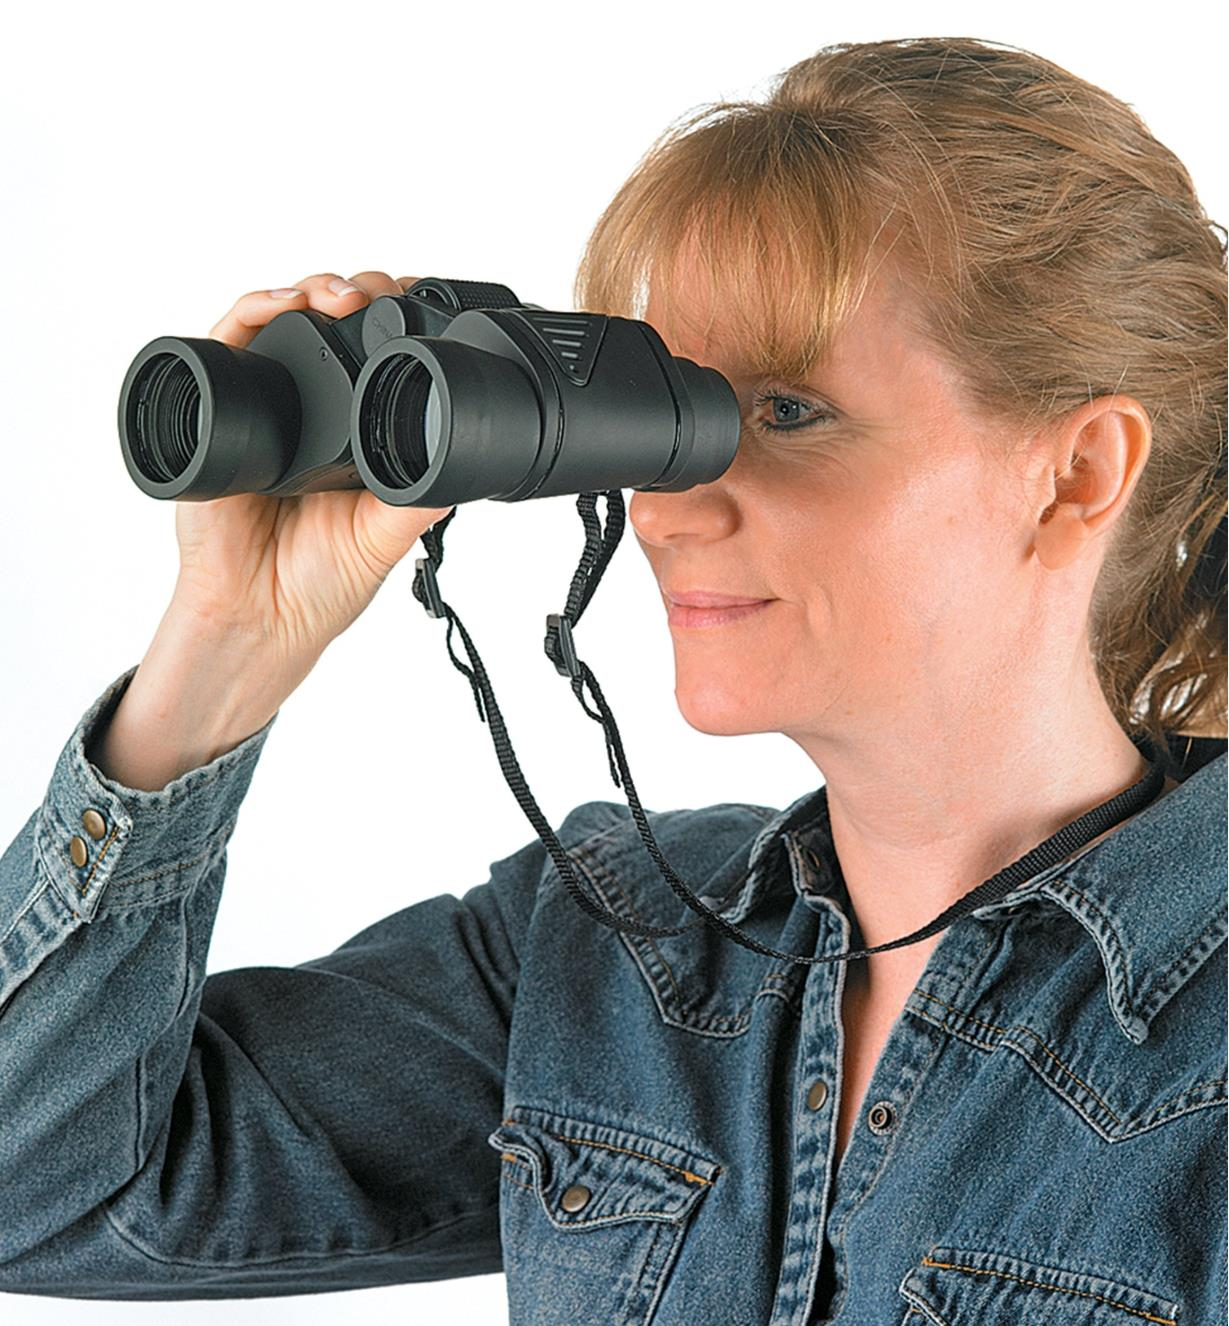 A woman looks through a pair of Binoculars